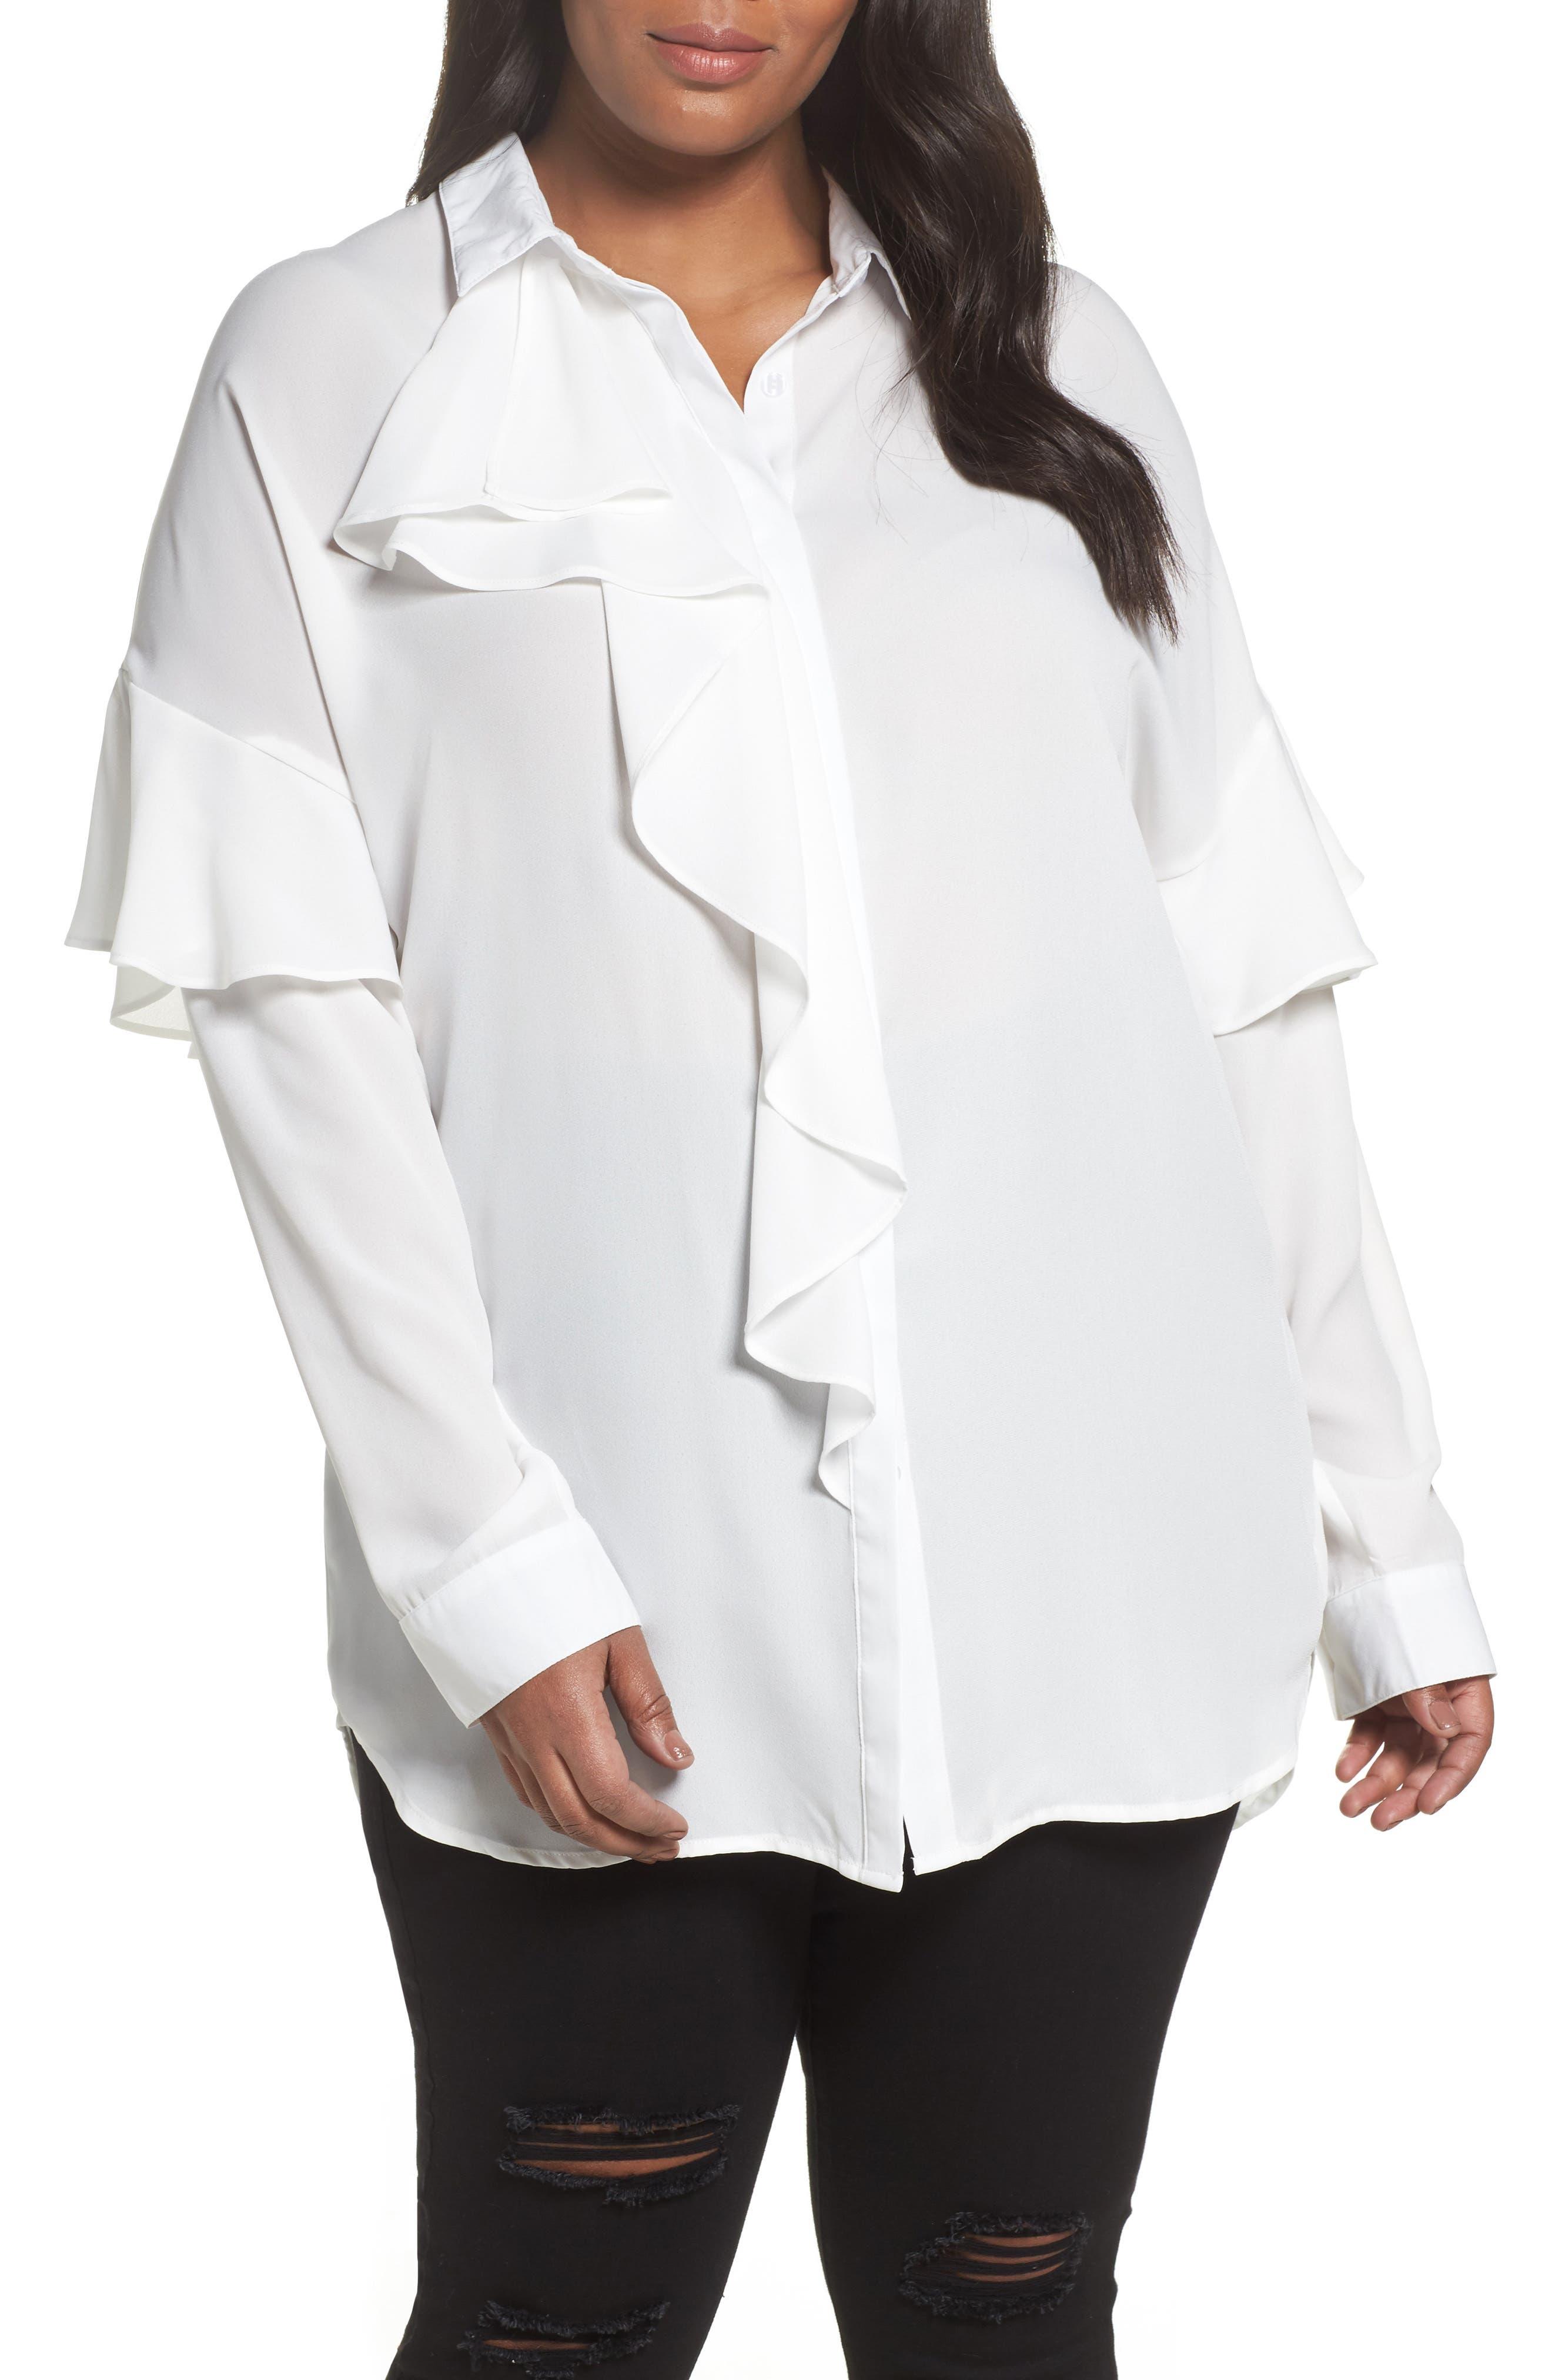 Main Image - Glamorous Asymmetrical Ruffle Blouse (Plus Size)